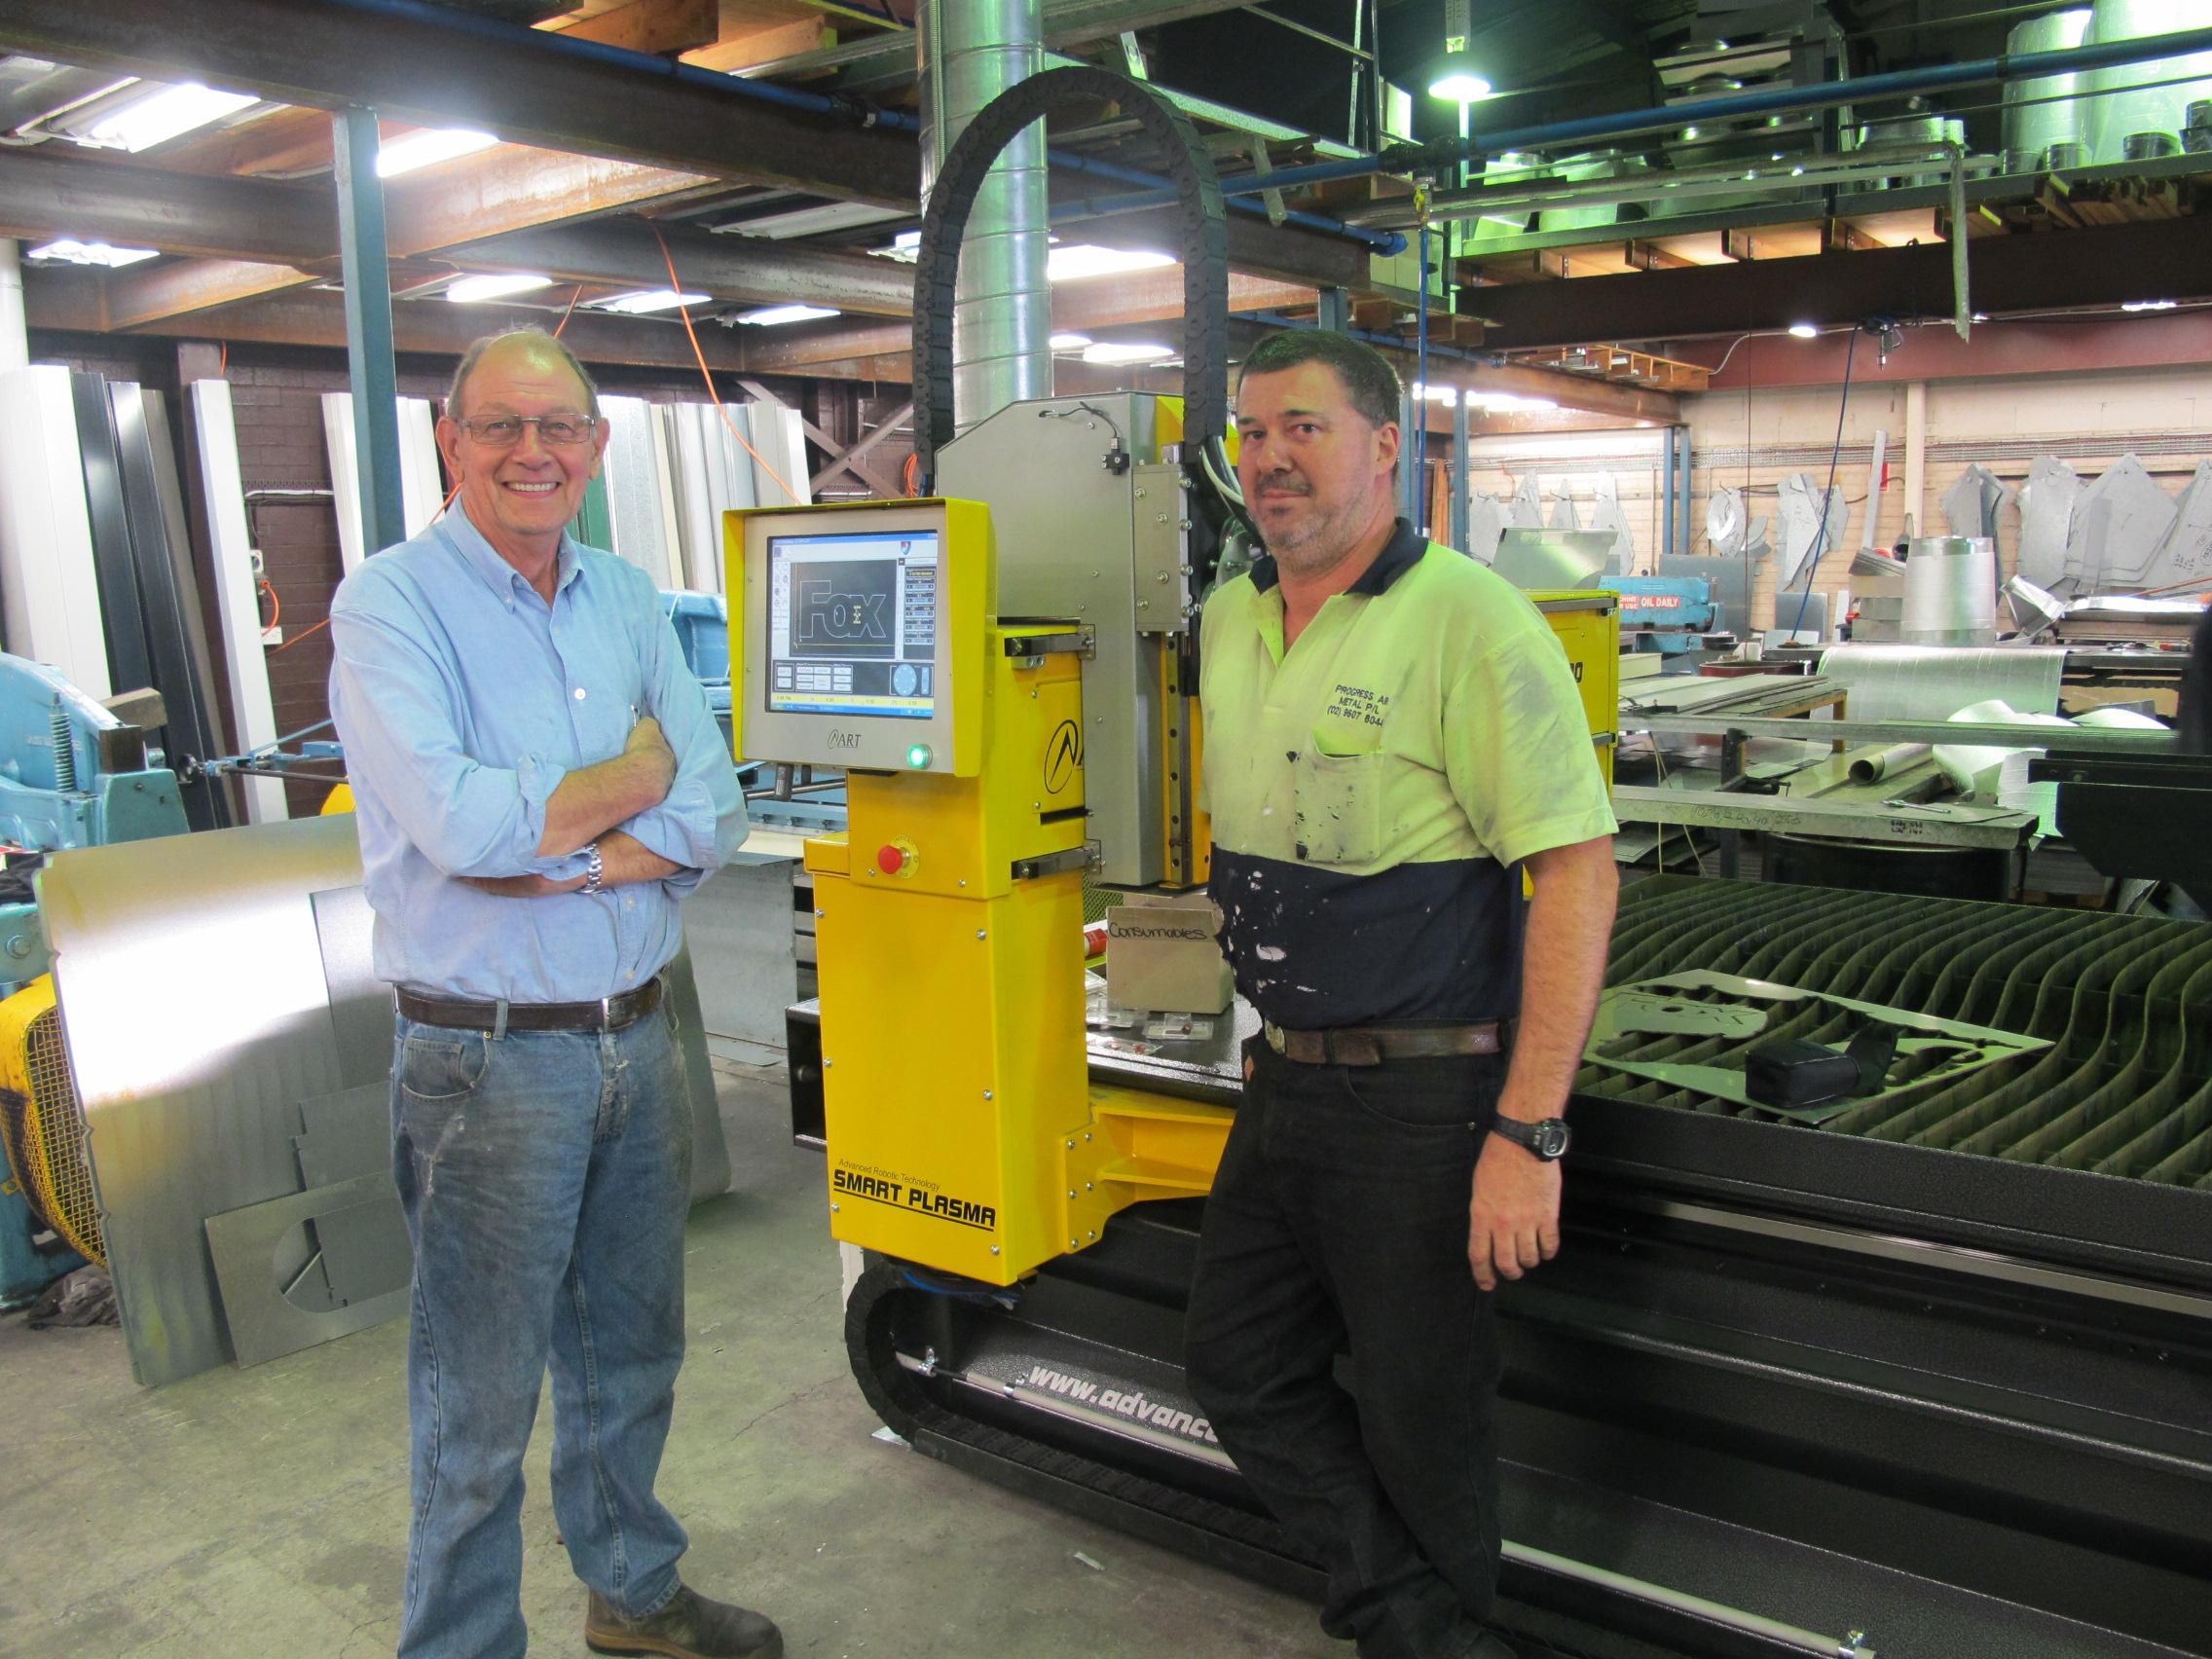 Progress Air Frank Van Winden and company owner Rod Peters